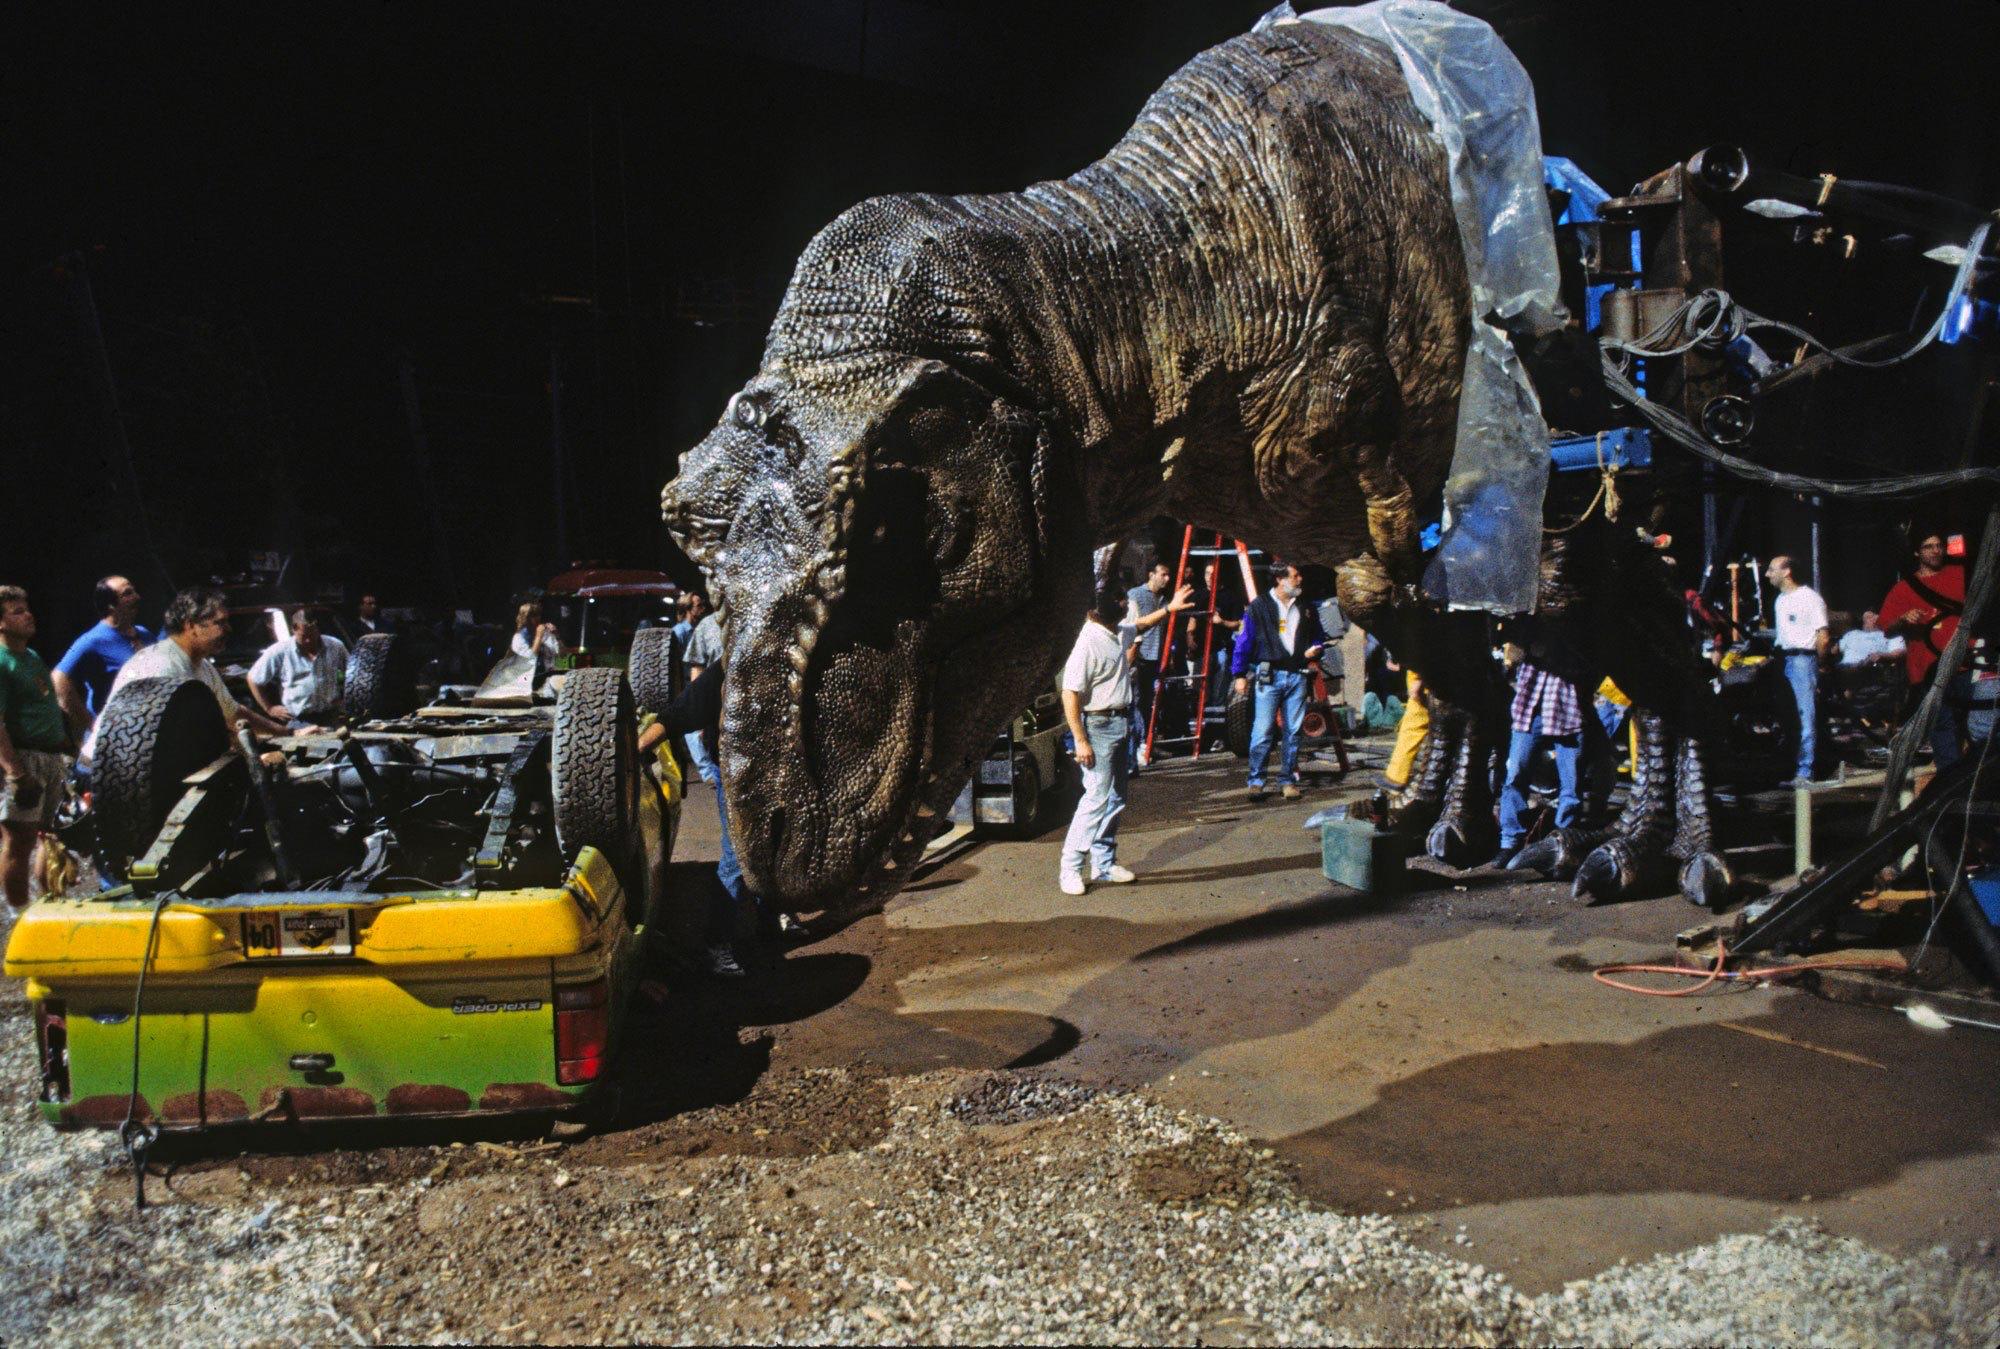 Jurassic Park BTS - Pic 3.